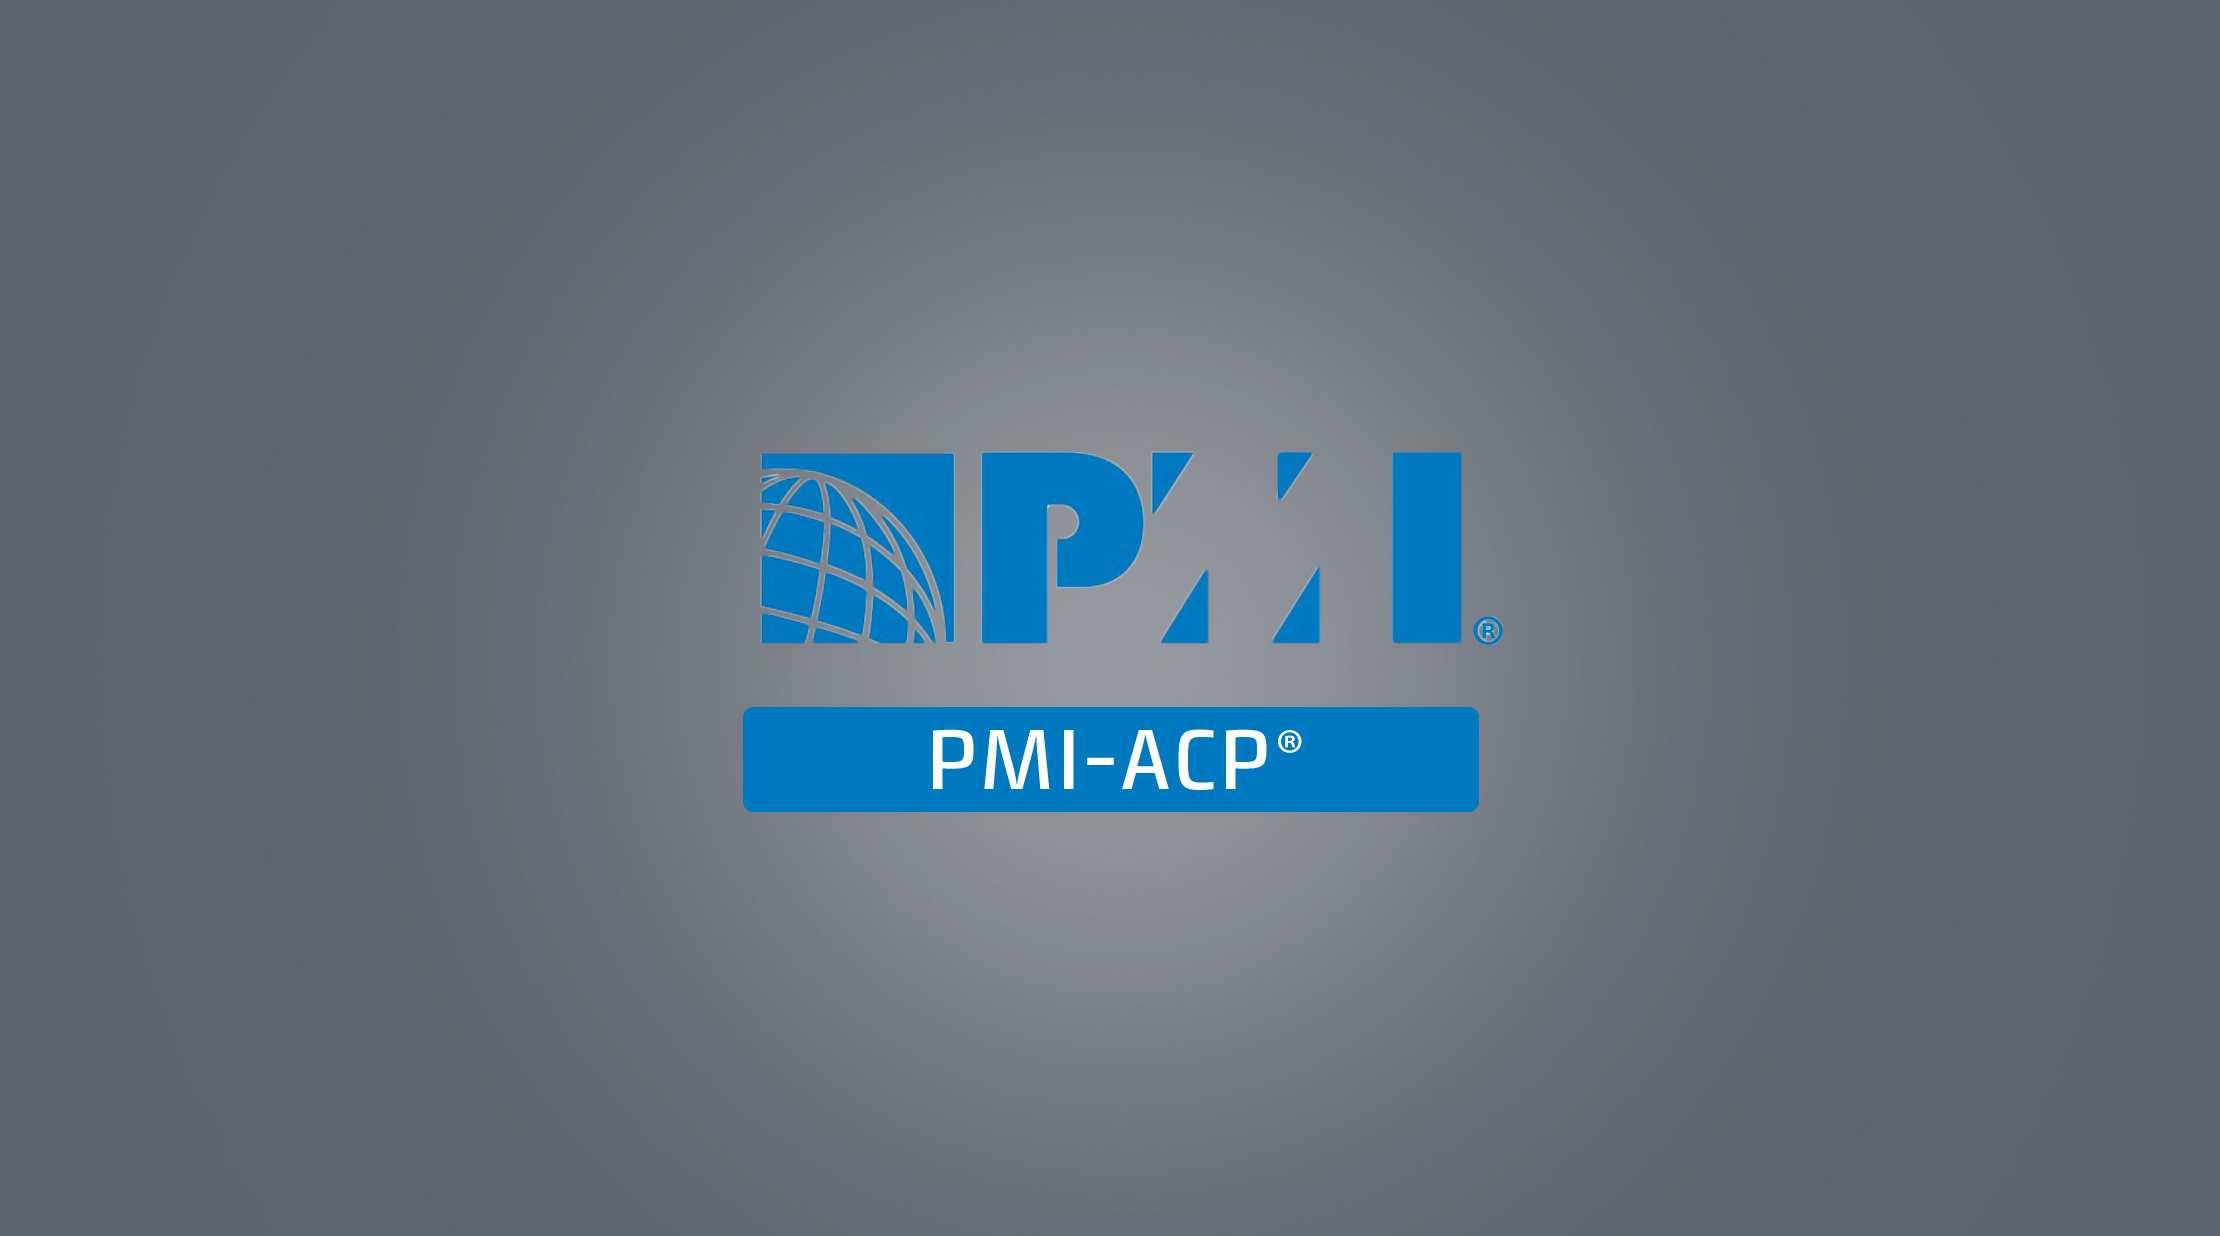 Online kursus pmi agile certified practitioner pmi acp online kursus pmi agile certified practitioner pmi acp kurser teknologisk institut 1betcityfo Images